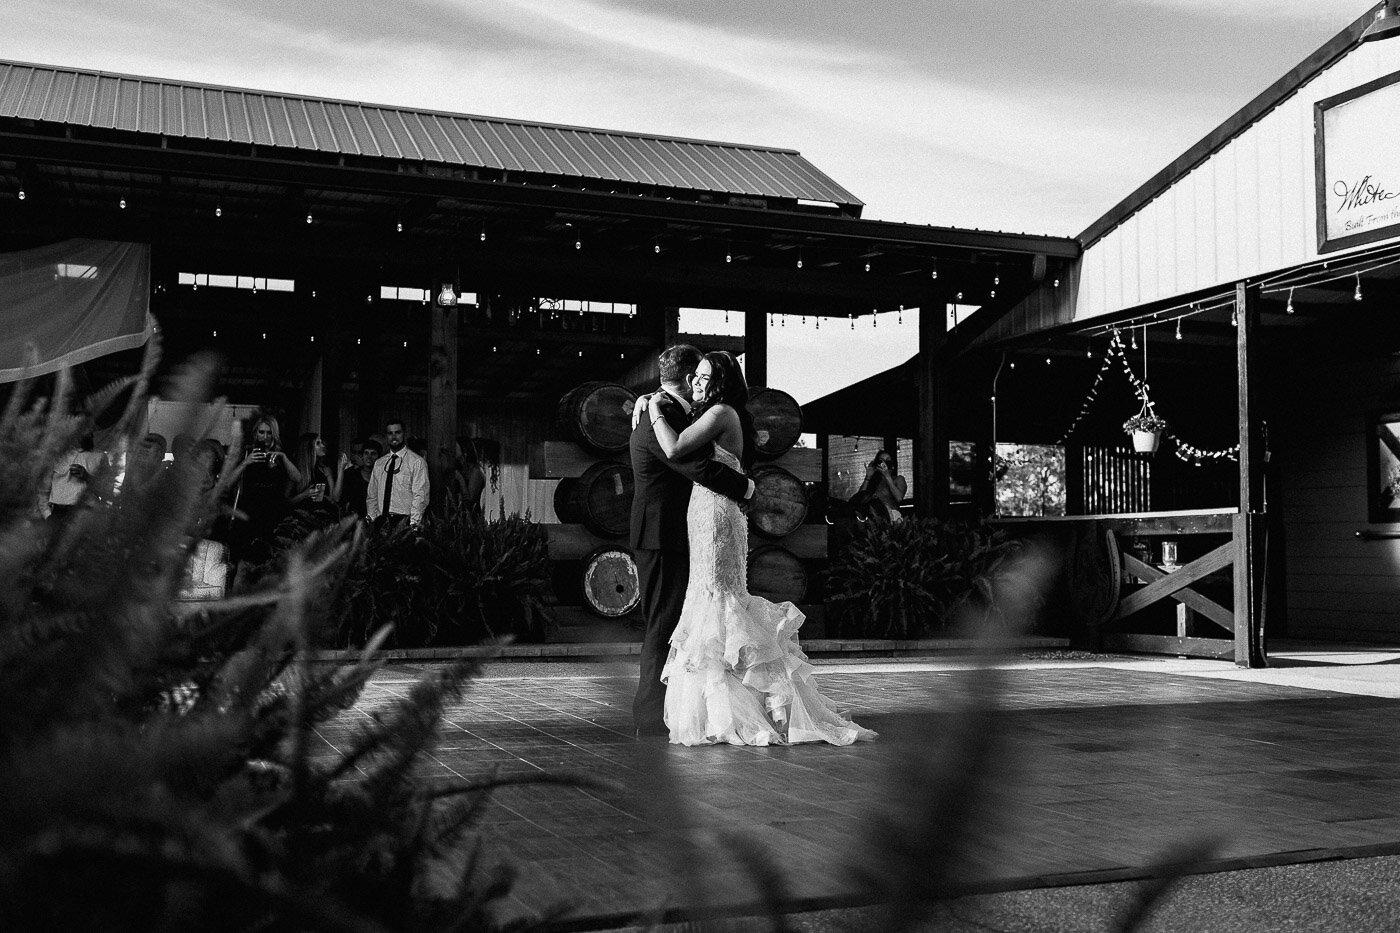 Lakeland-barn-wedding-at-white-horse-ranch-85.jpg